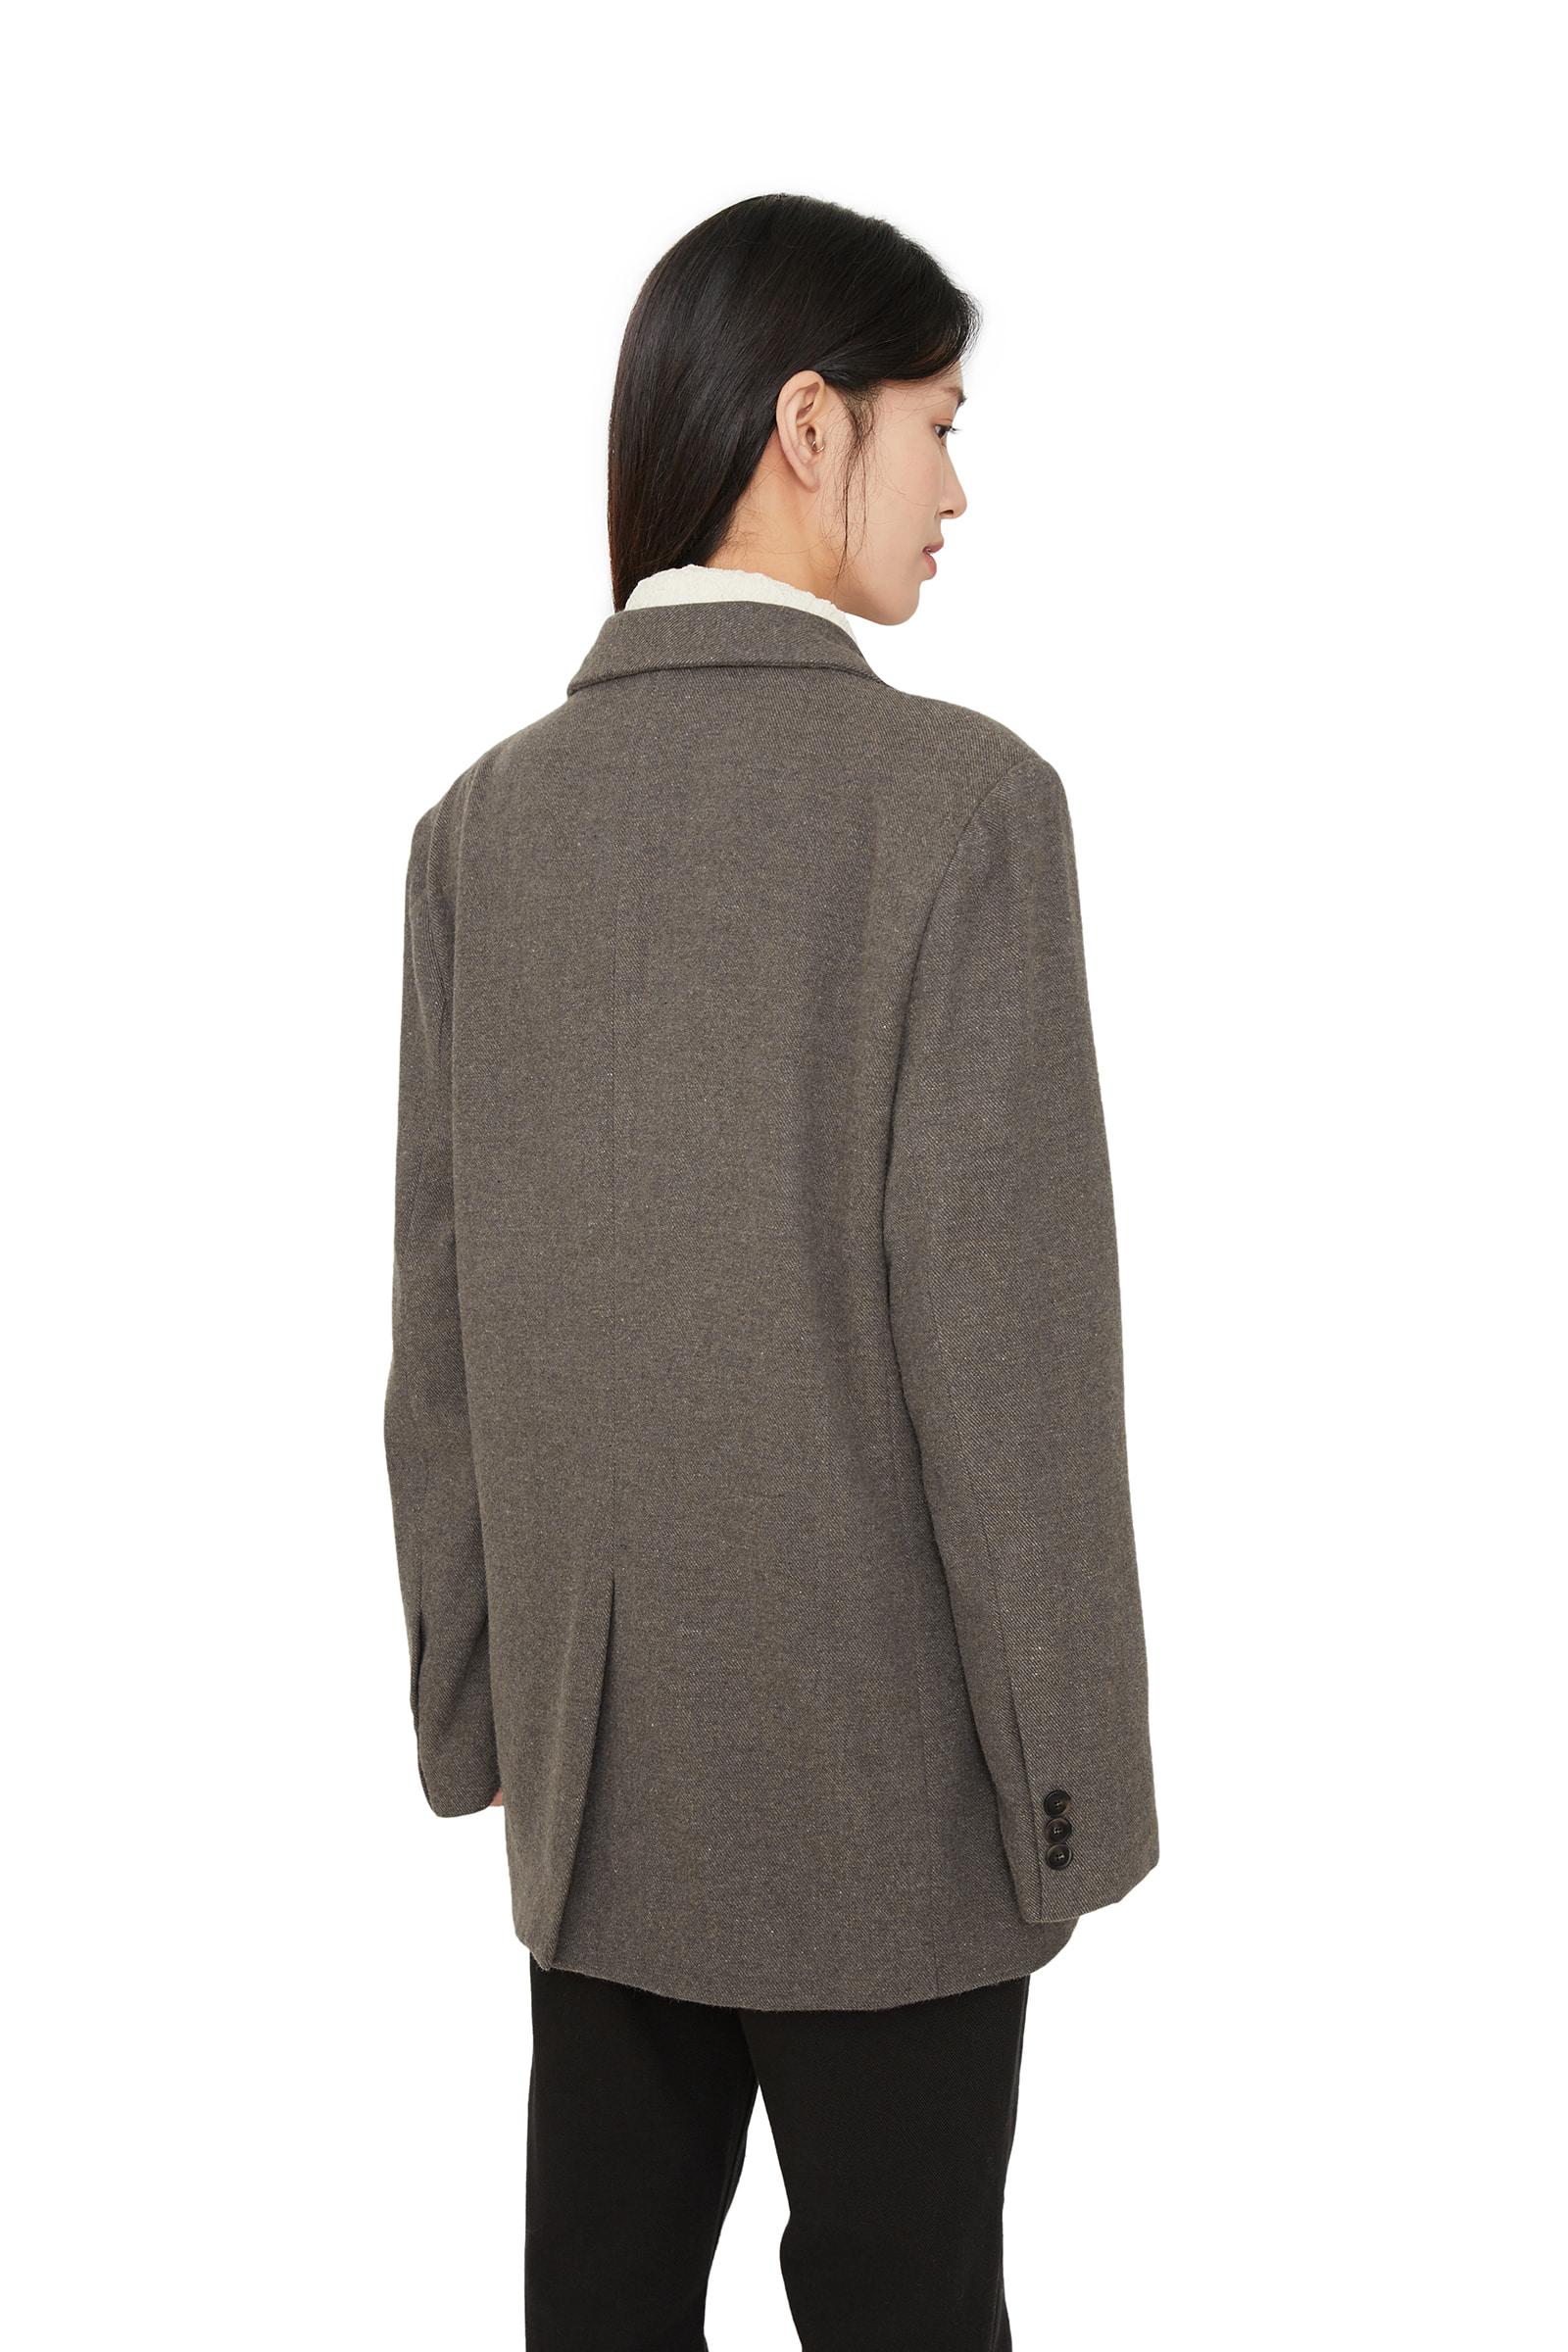 Raul wool single blazer